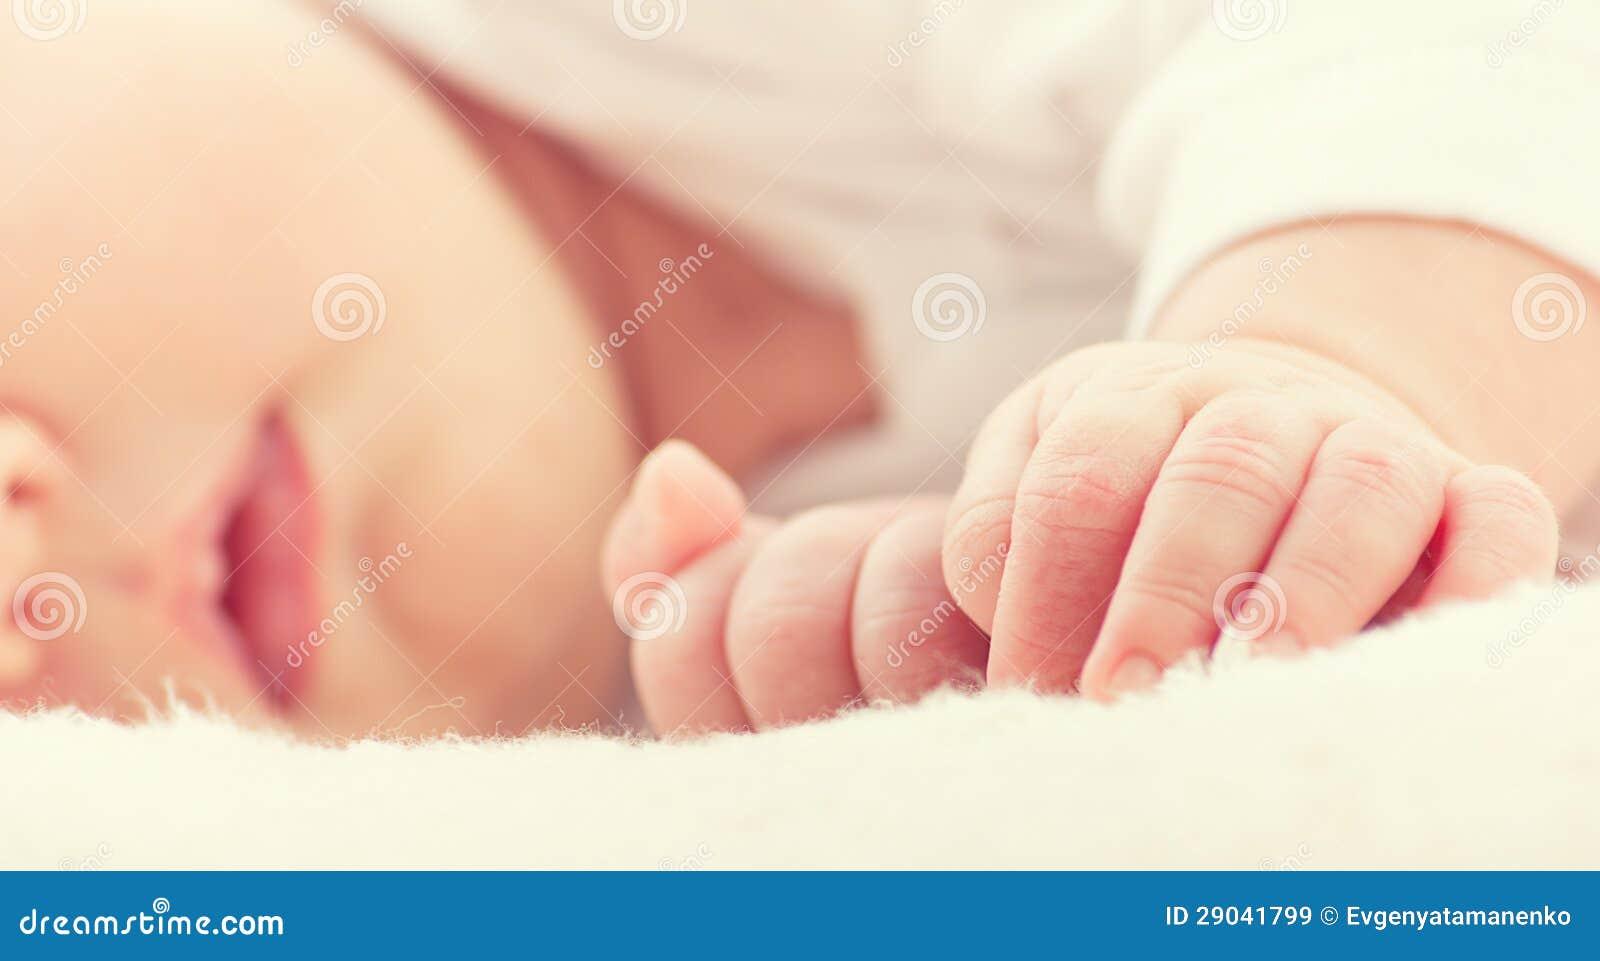 Hand of sleeping baby newborn close up